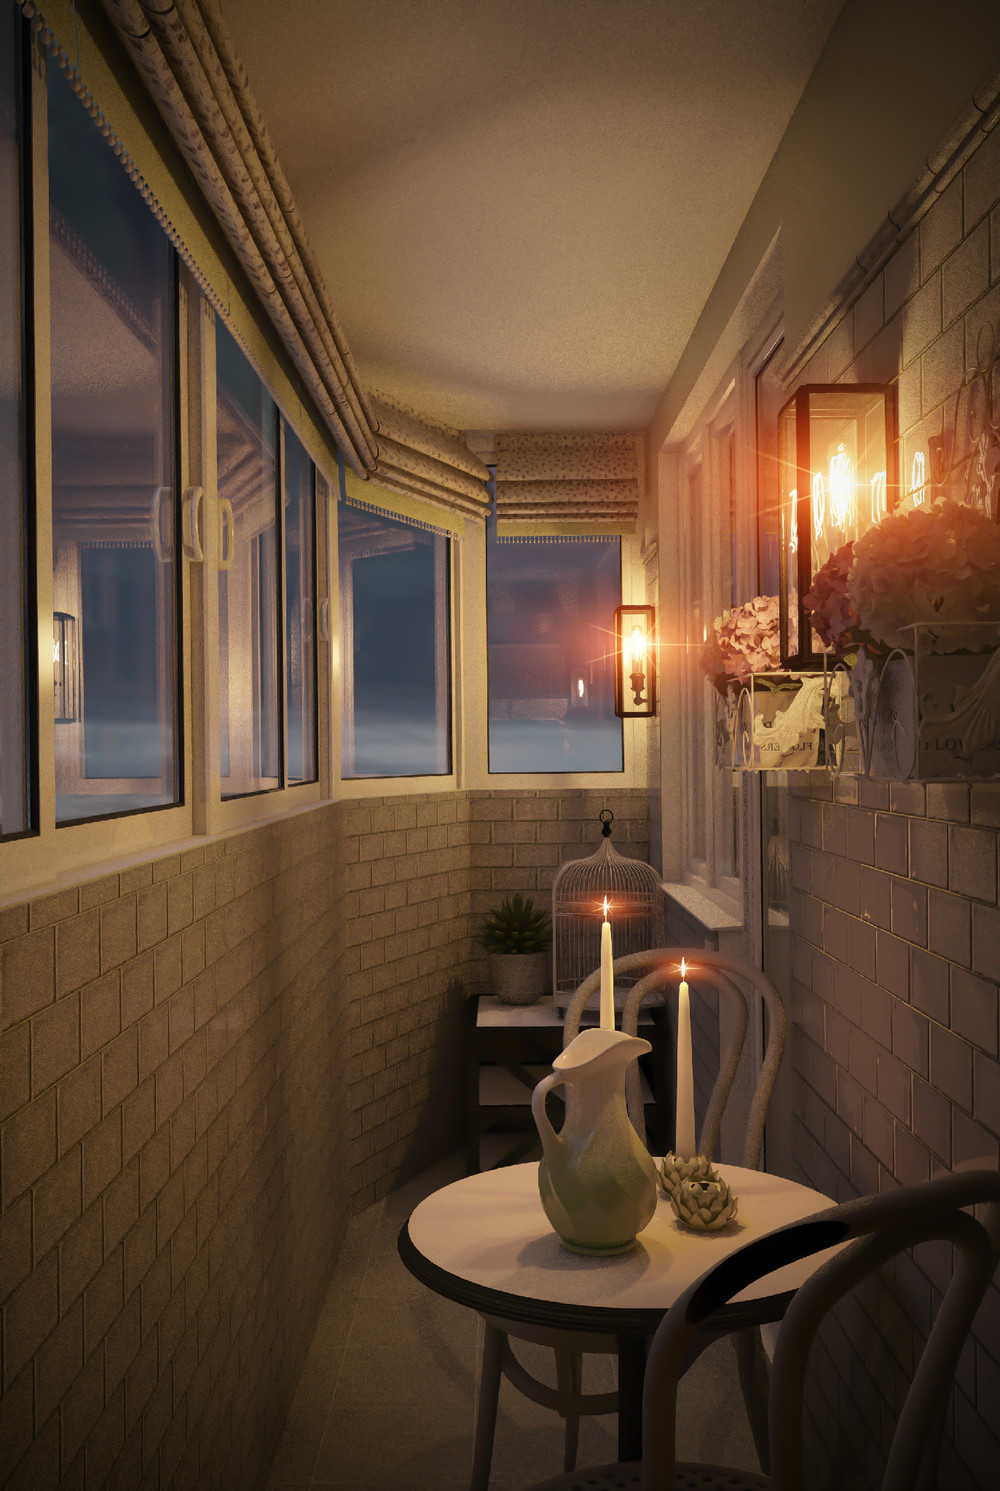 Фото оформления балкона в стиле прованс.